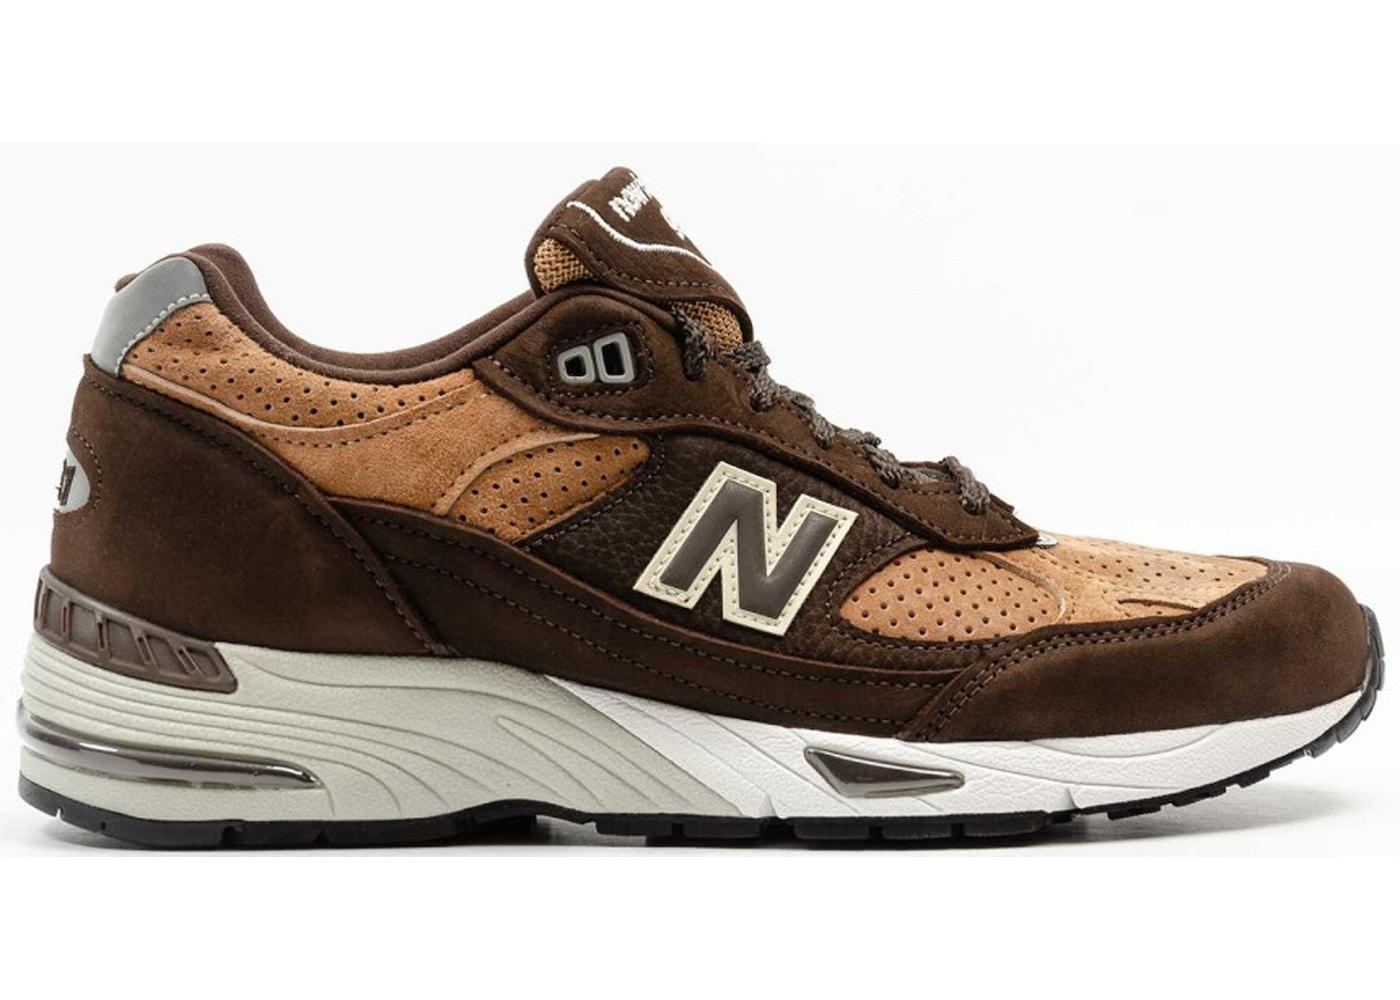 New Balance 991 Brown Tan